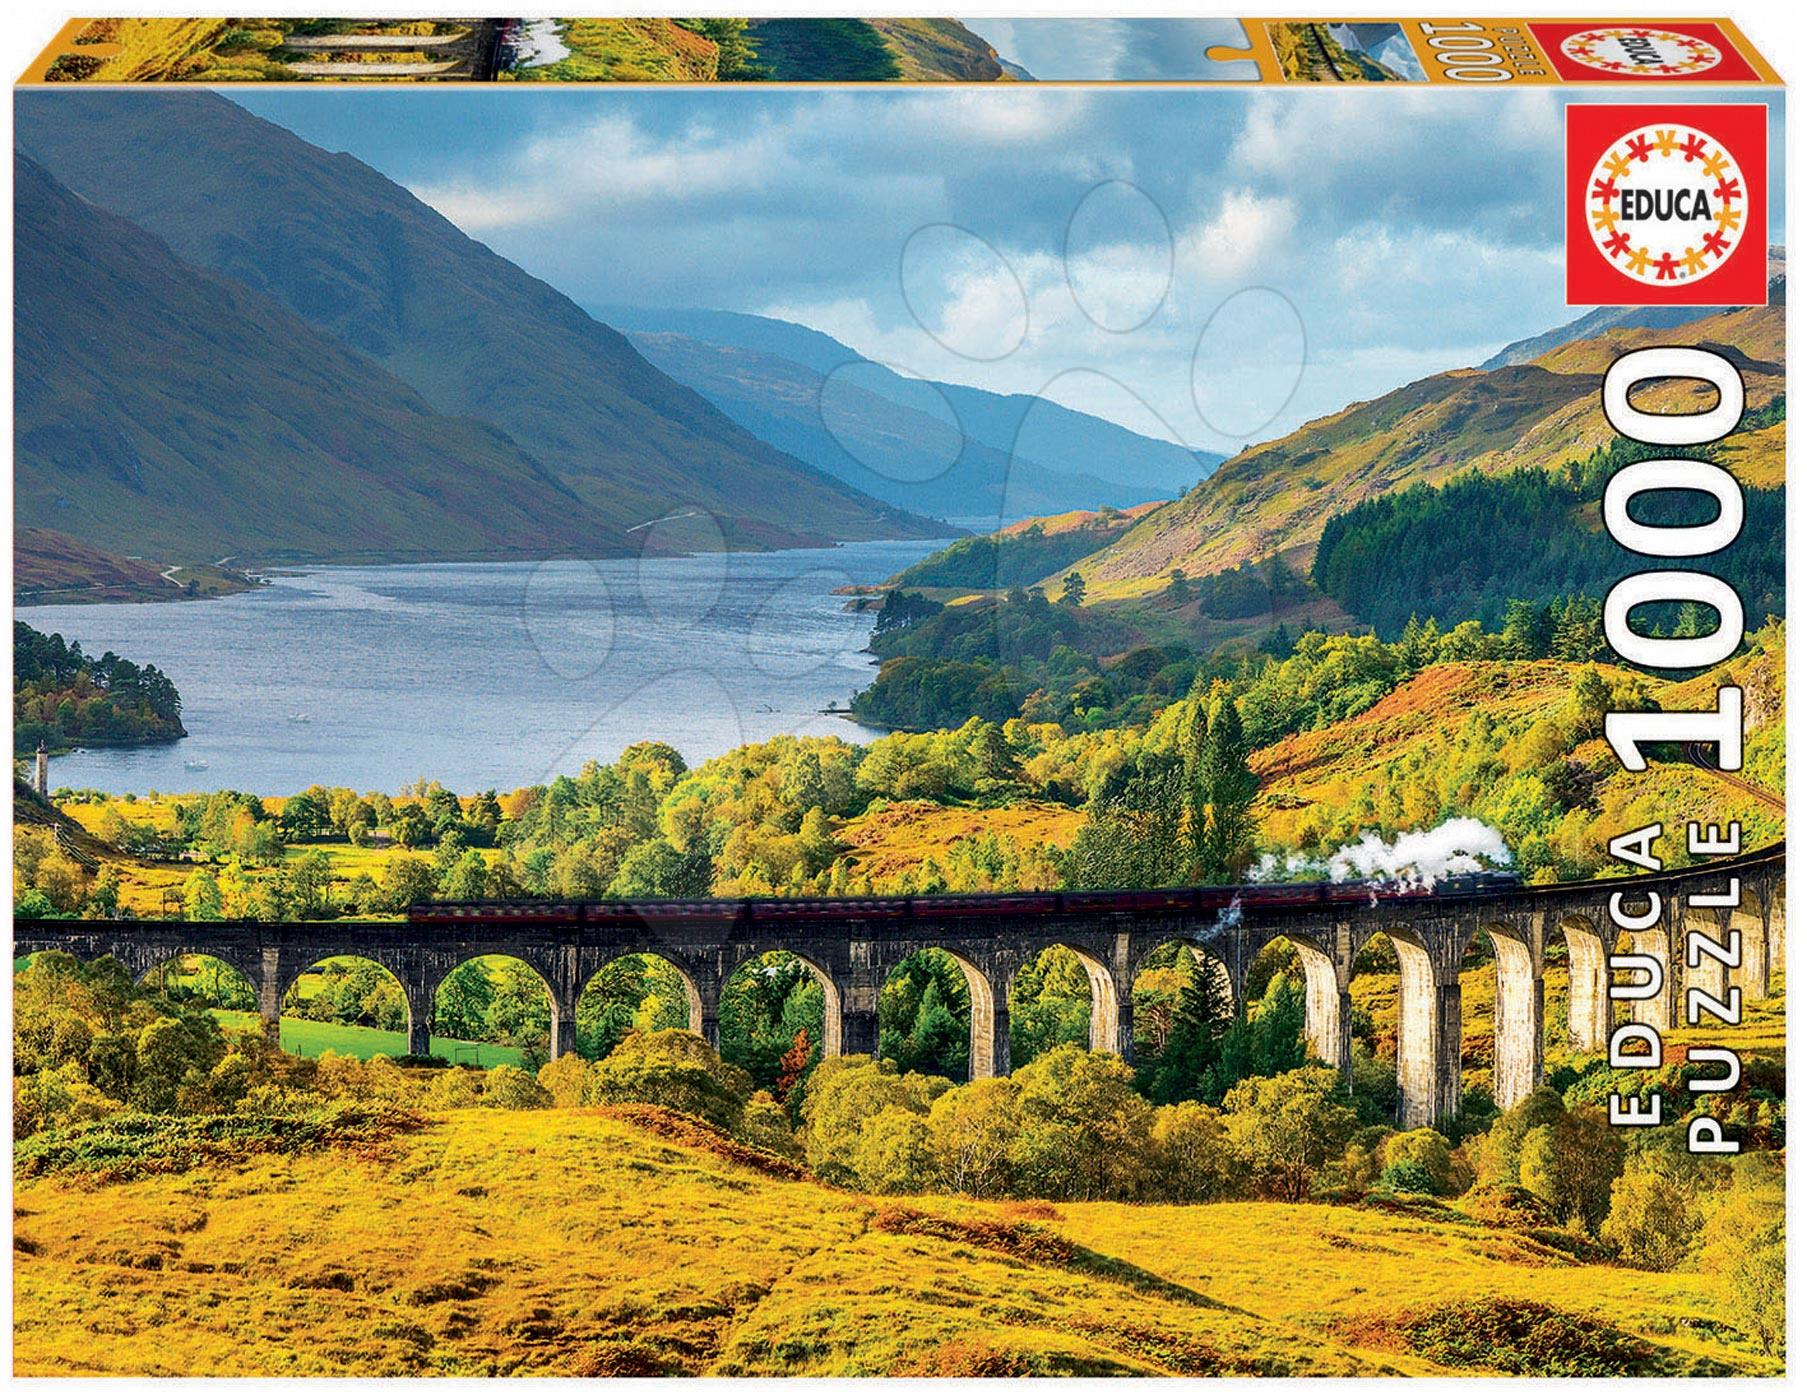 Puzzle Genuine Glenfinnan viaduct, Scotland Educa 1000 dílů od 12 let